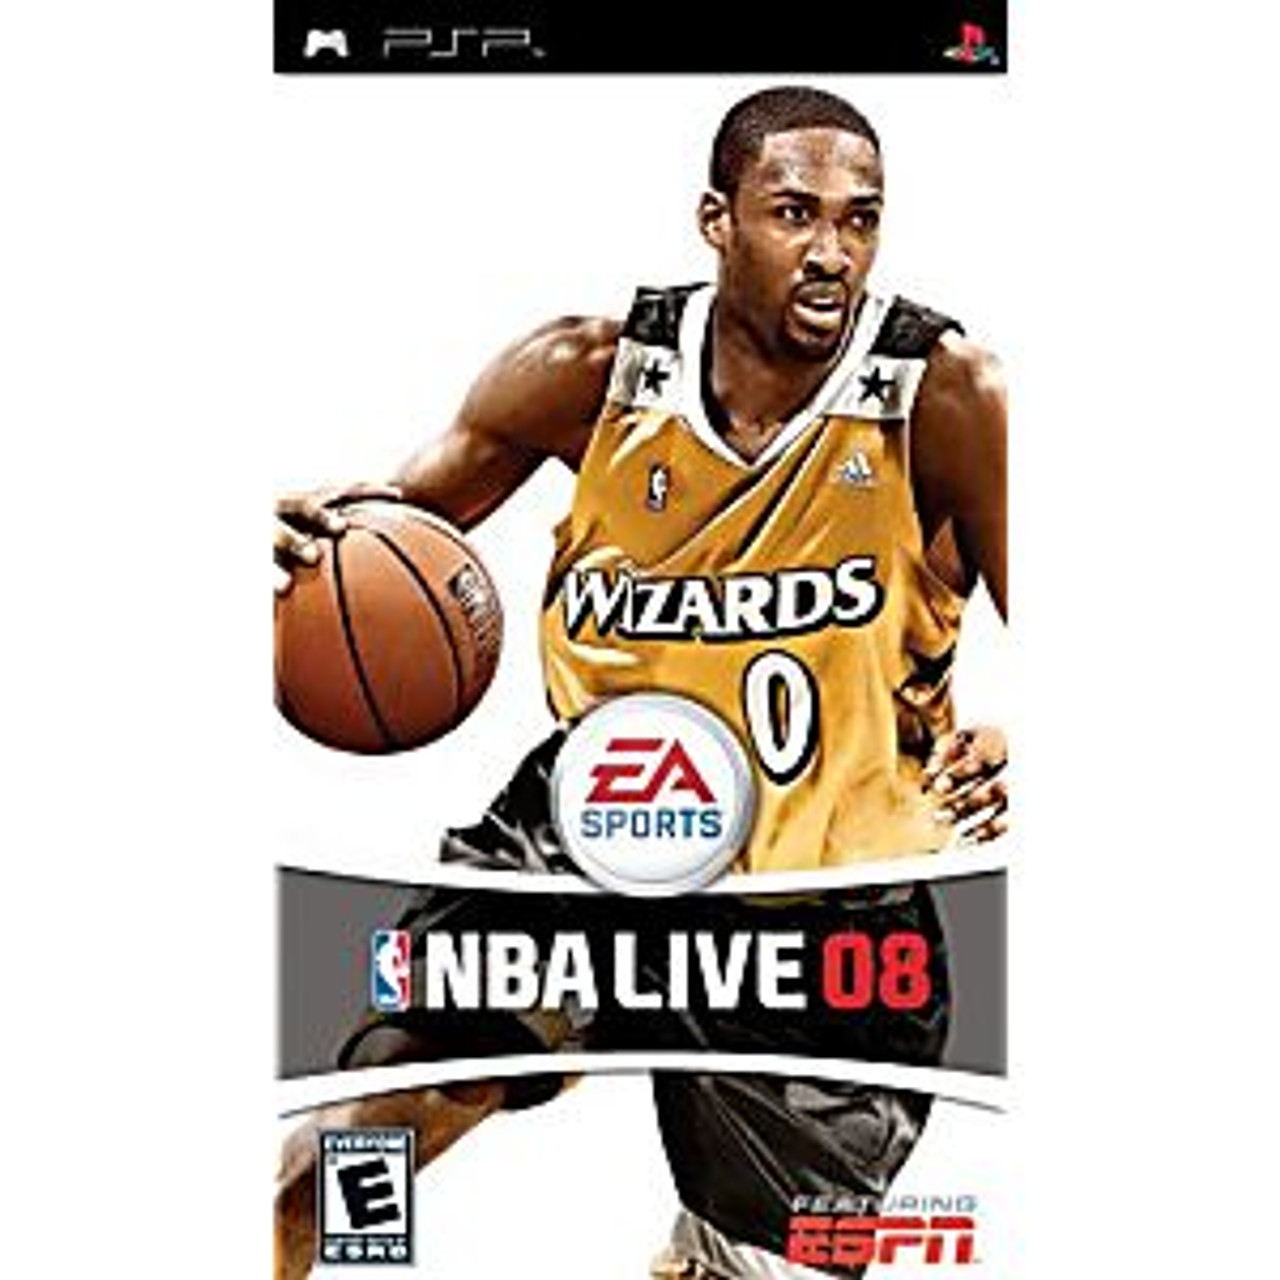 NBA LIVE 2008 - PSP